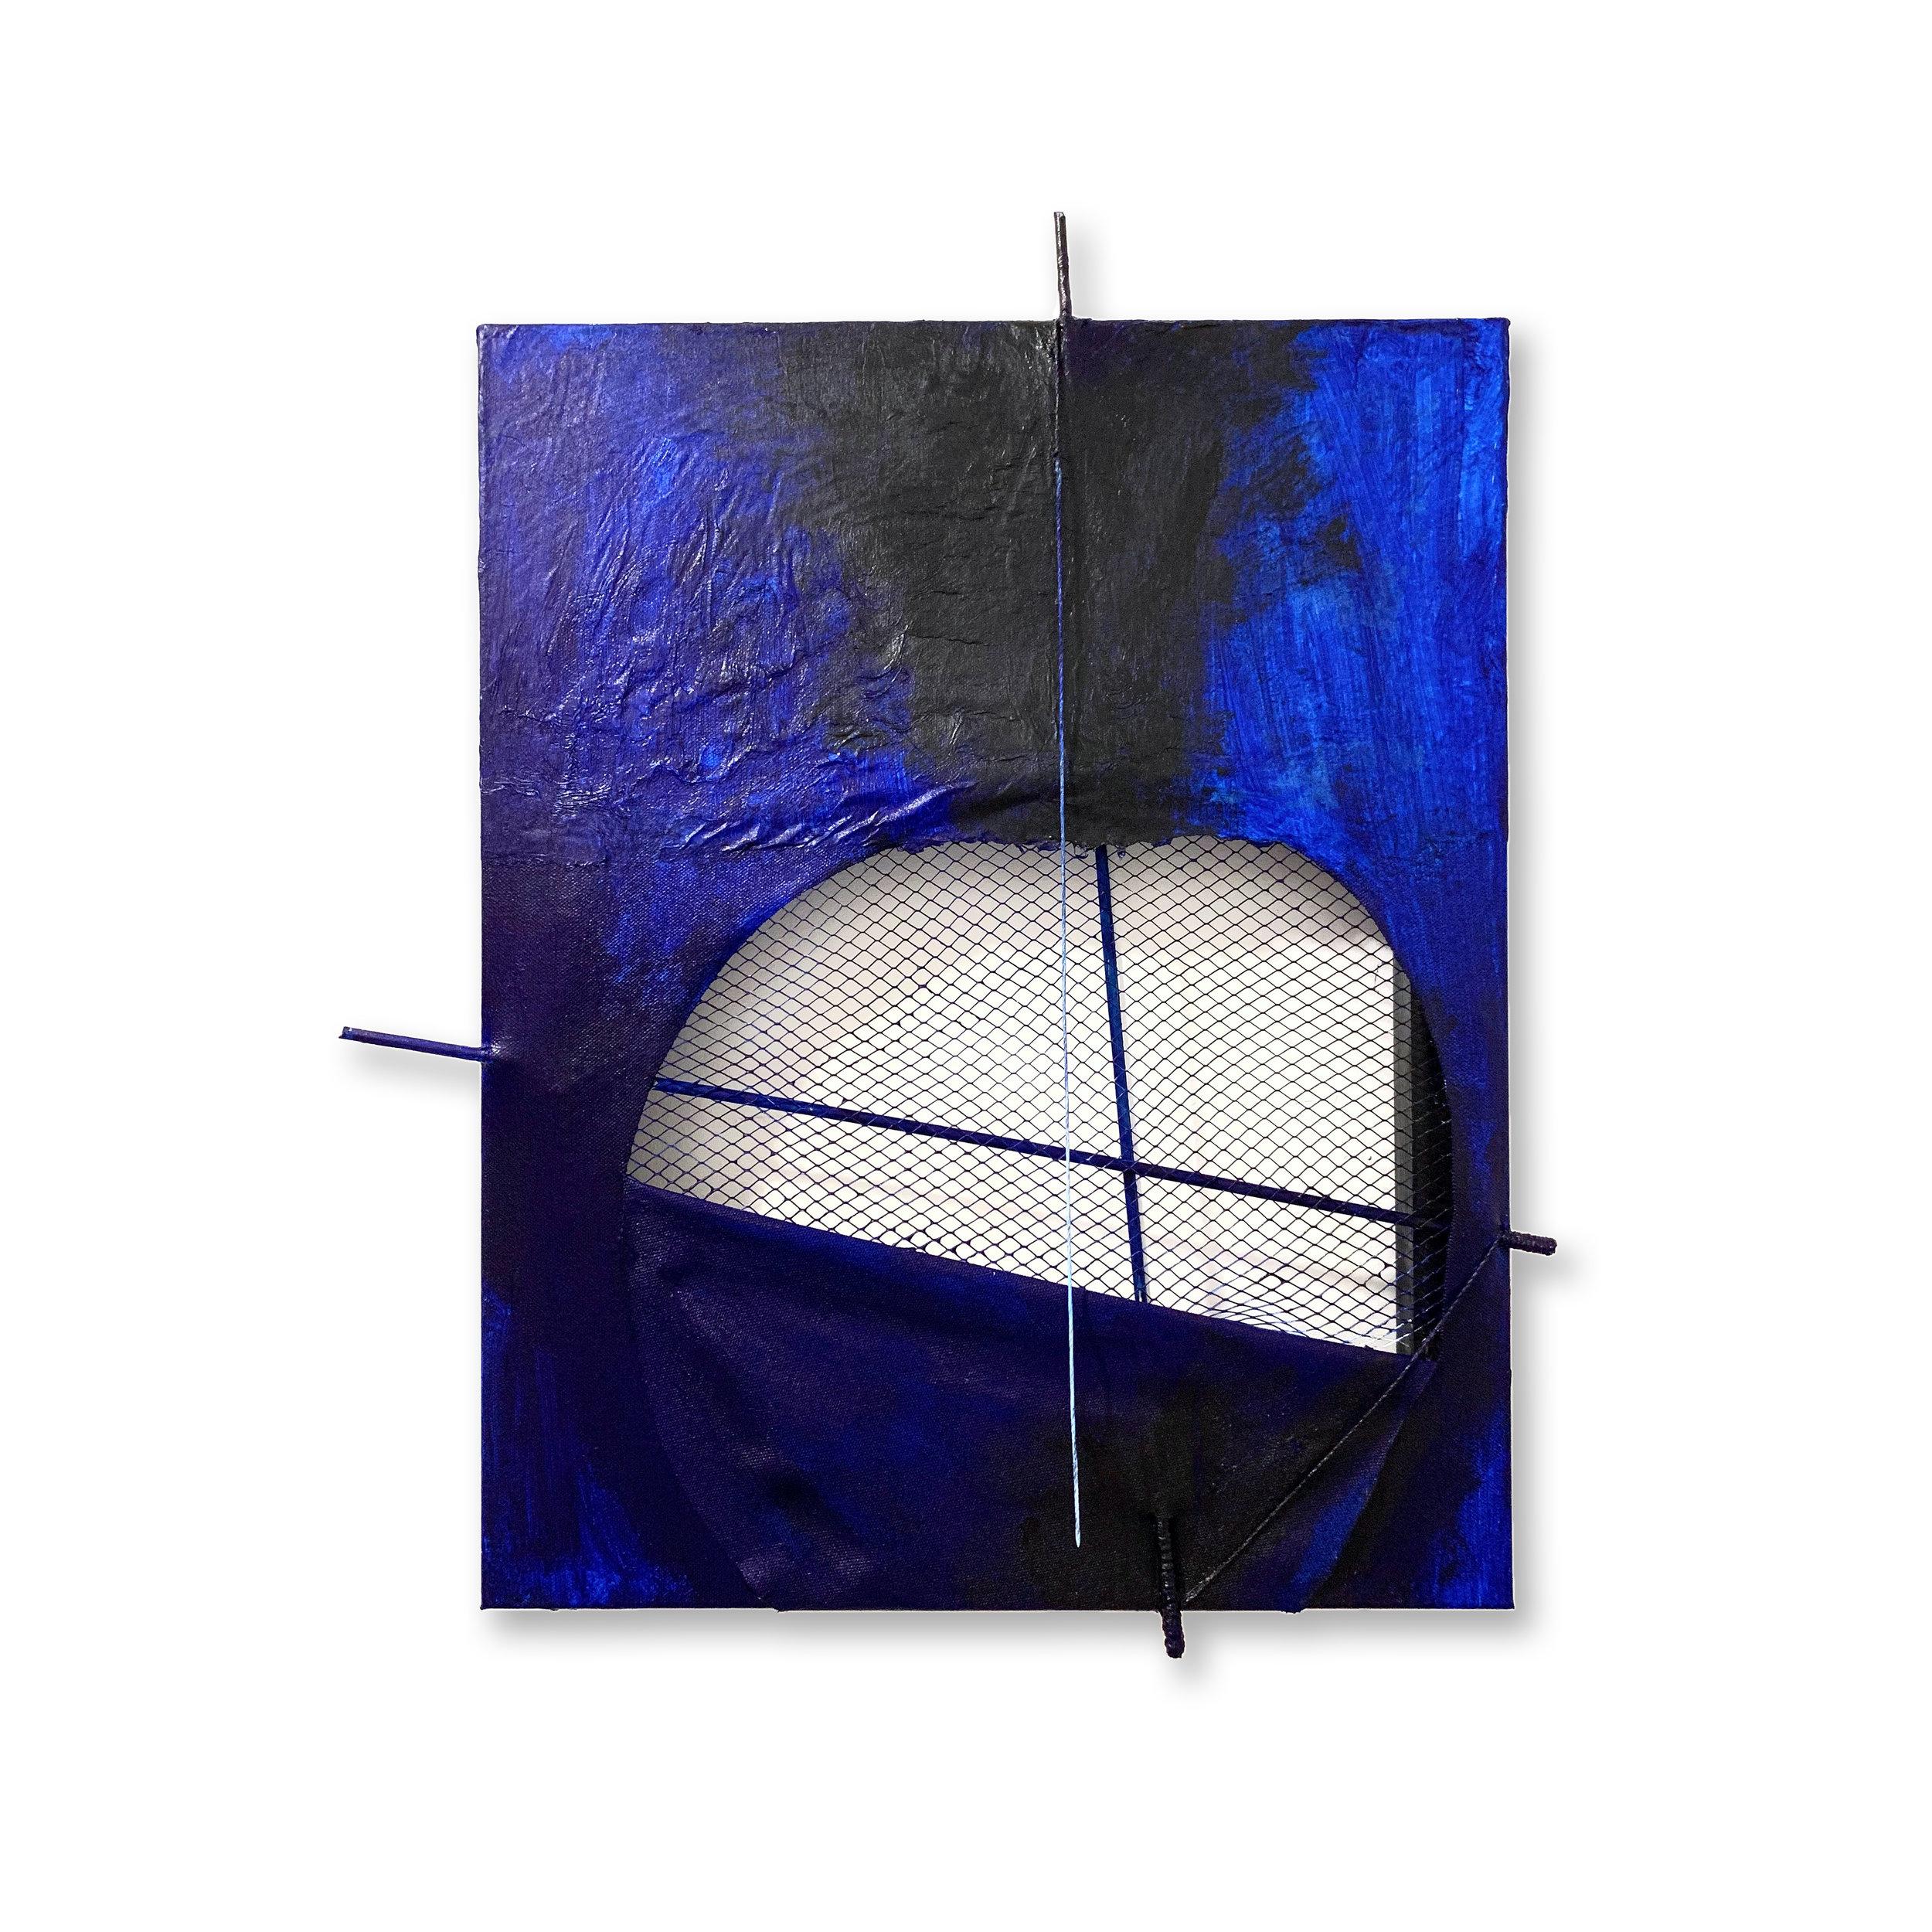 UNTITLED (BLUE), 2019